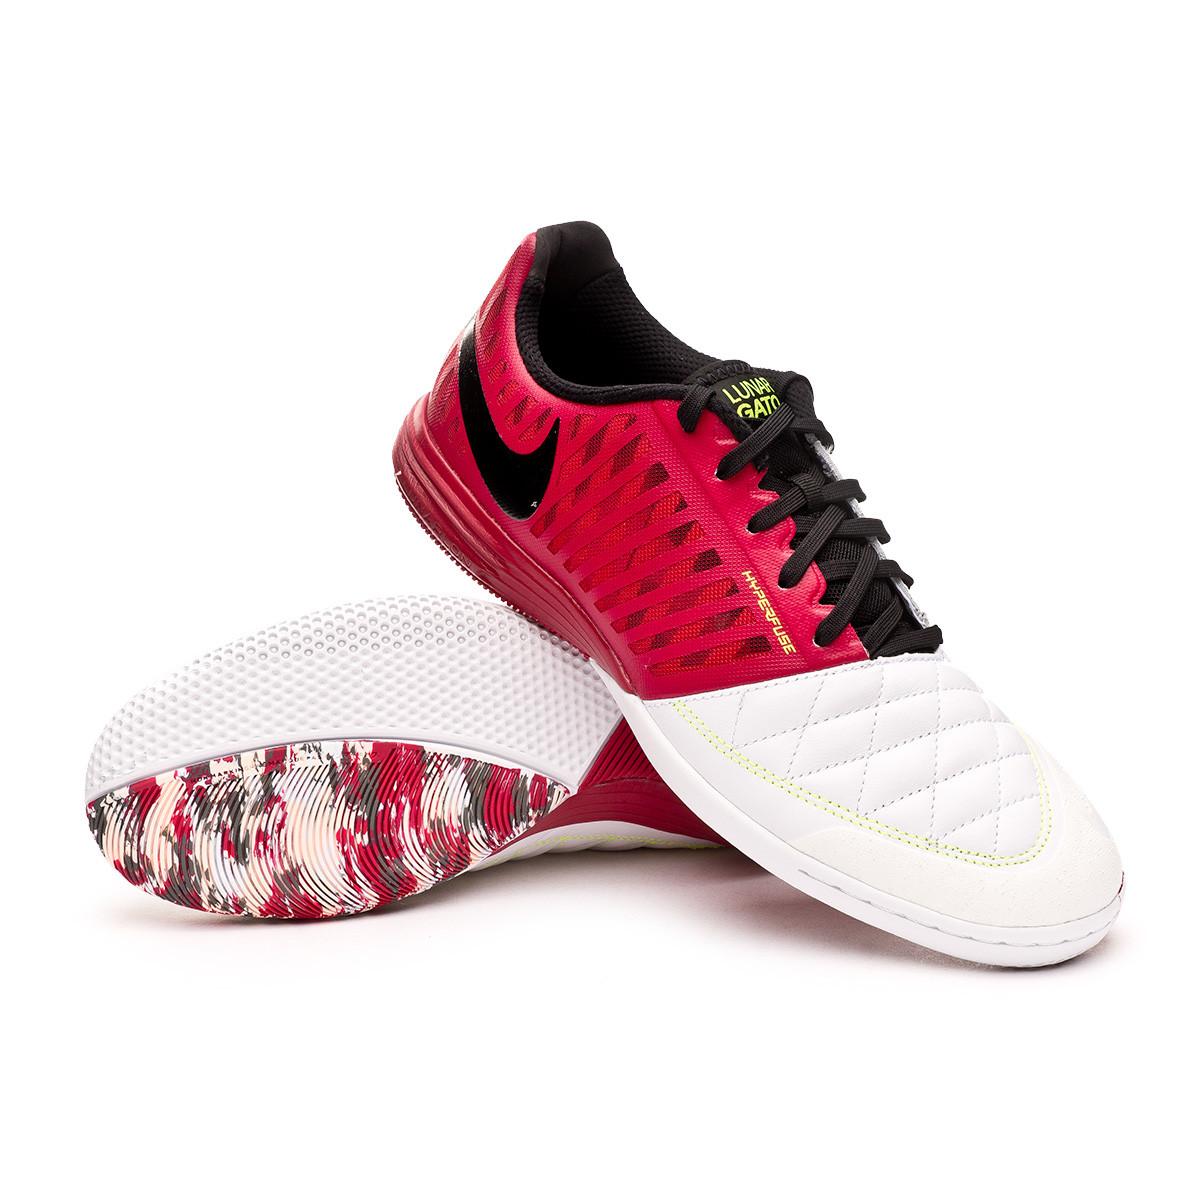 traición Volverse loco carolino  Futsal Boot Nike Lunar Gato II Cardinal red-Crimson tint-Black-White-Iron  gr - Football store Fútbol Emotion